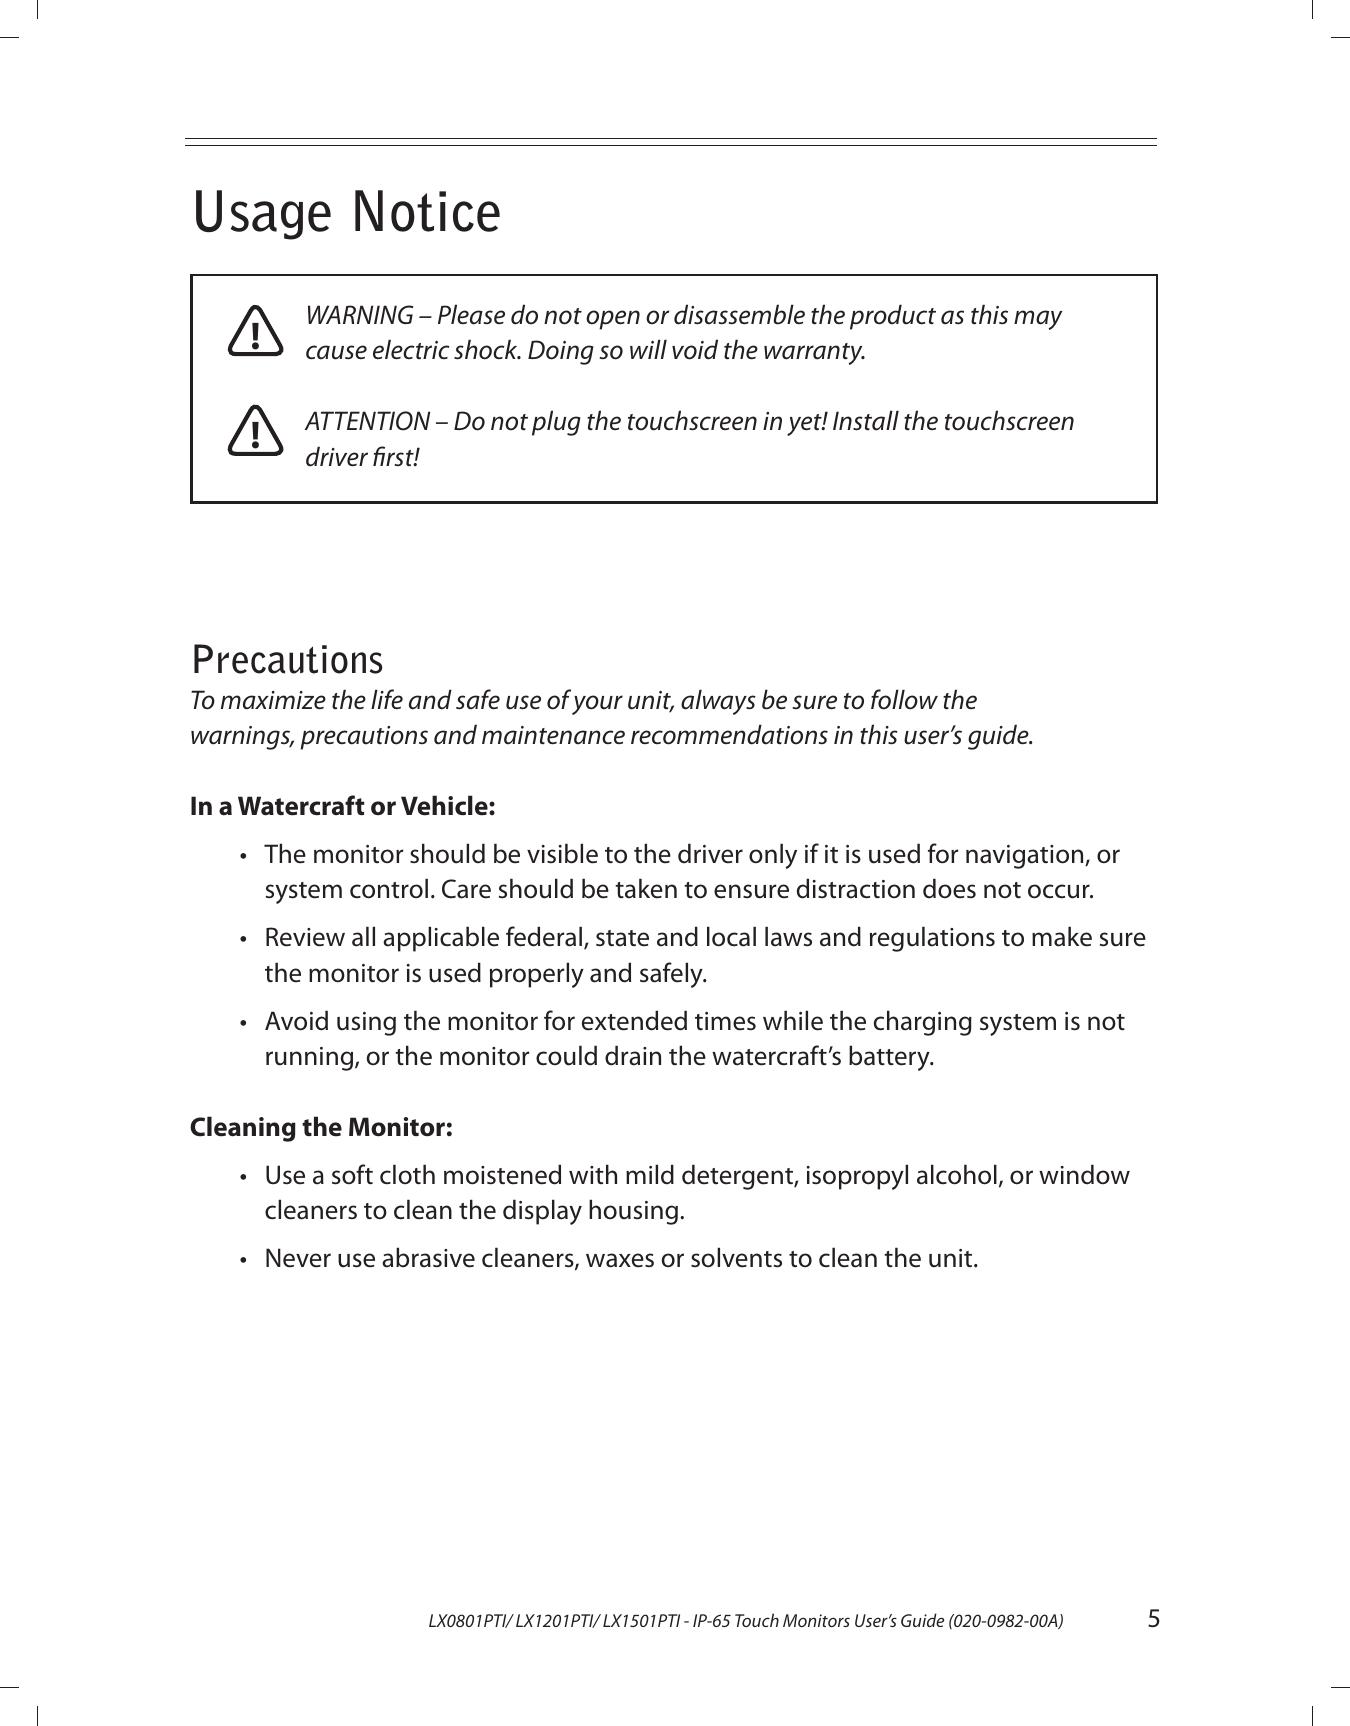 Planar LX1201PTI 9054 PLNR Mariner_UGREV4 User Manual To The